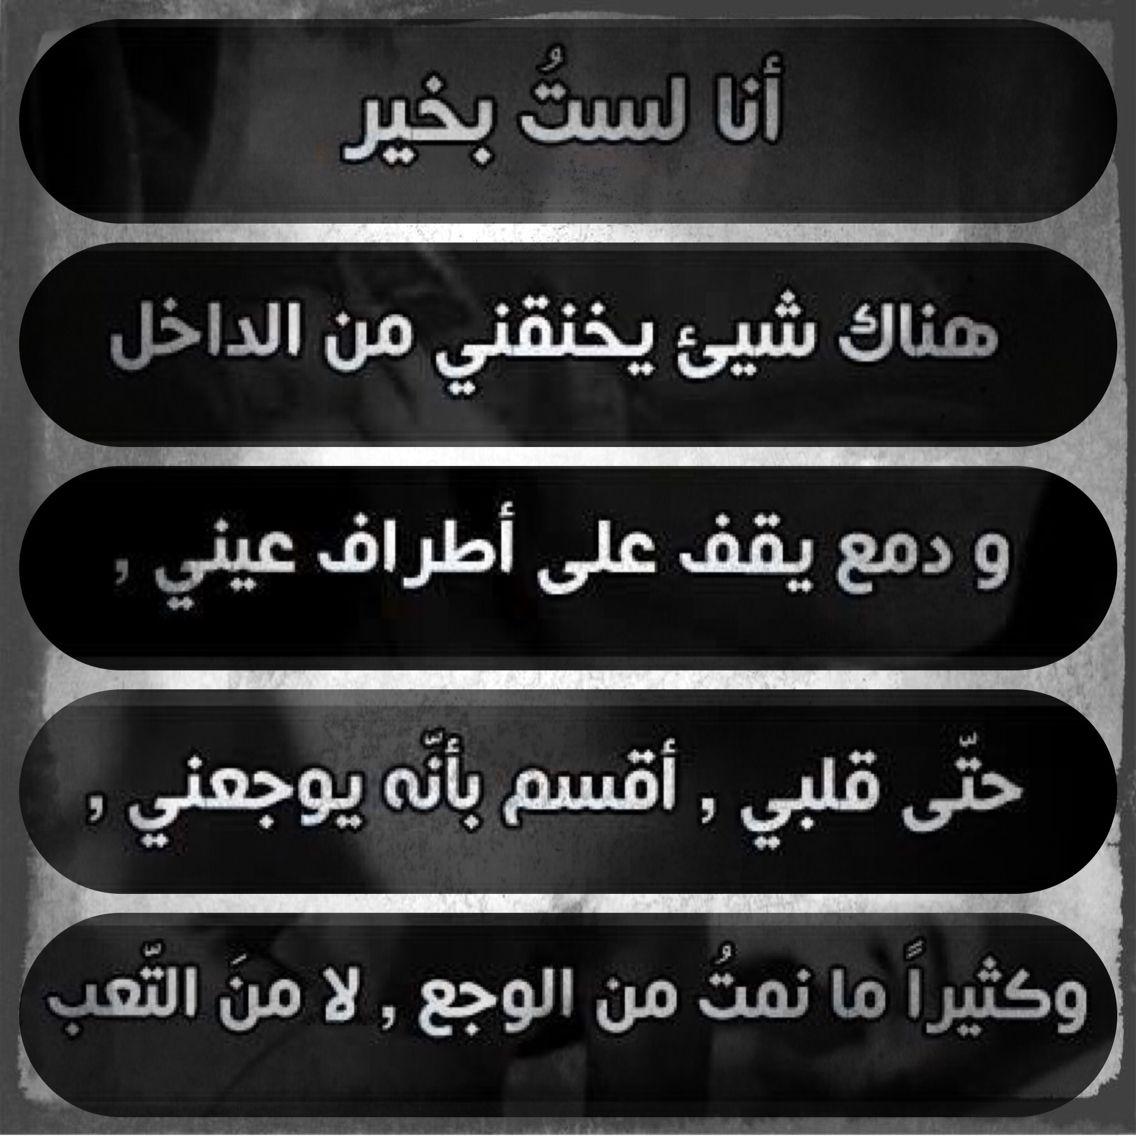 انا لست بخير Inspirational Quotes Arabic Words Words